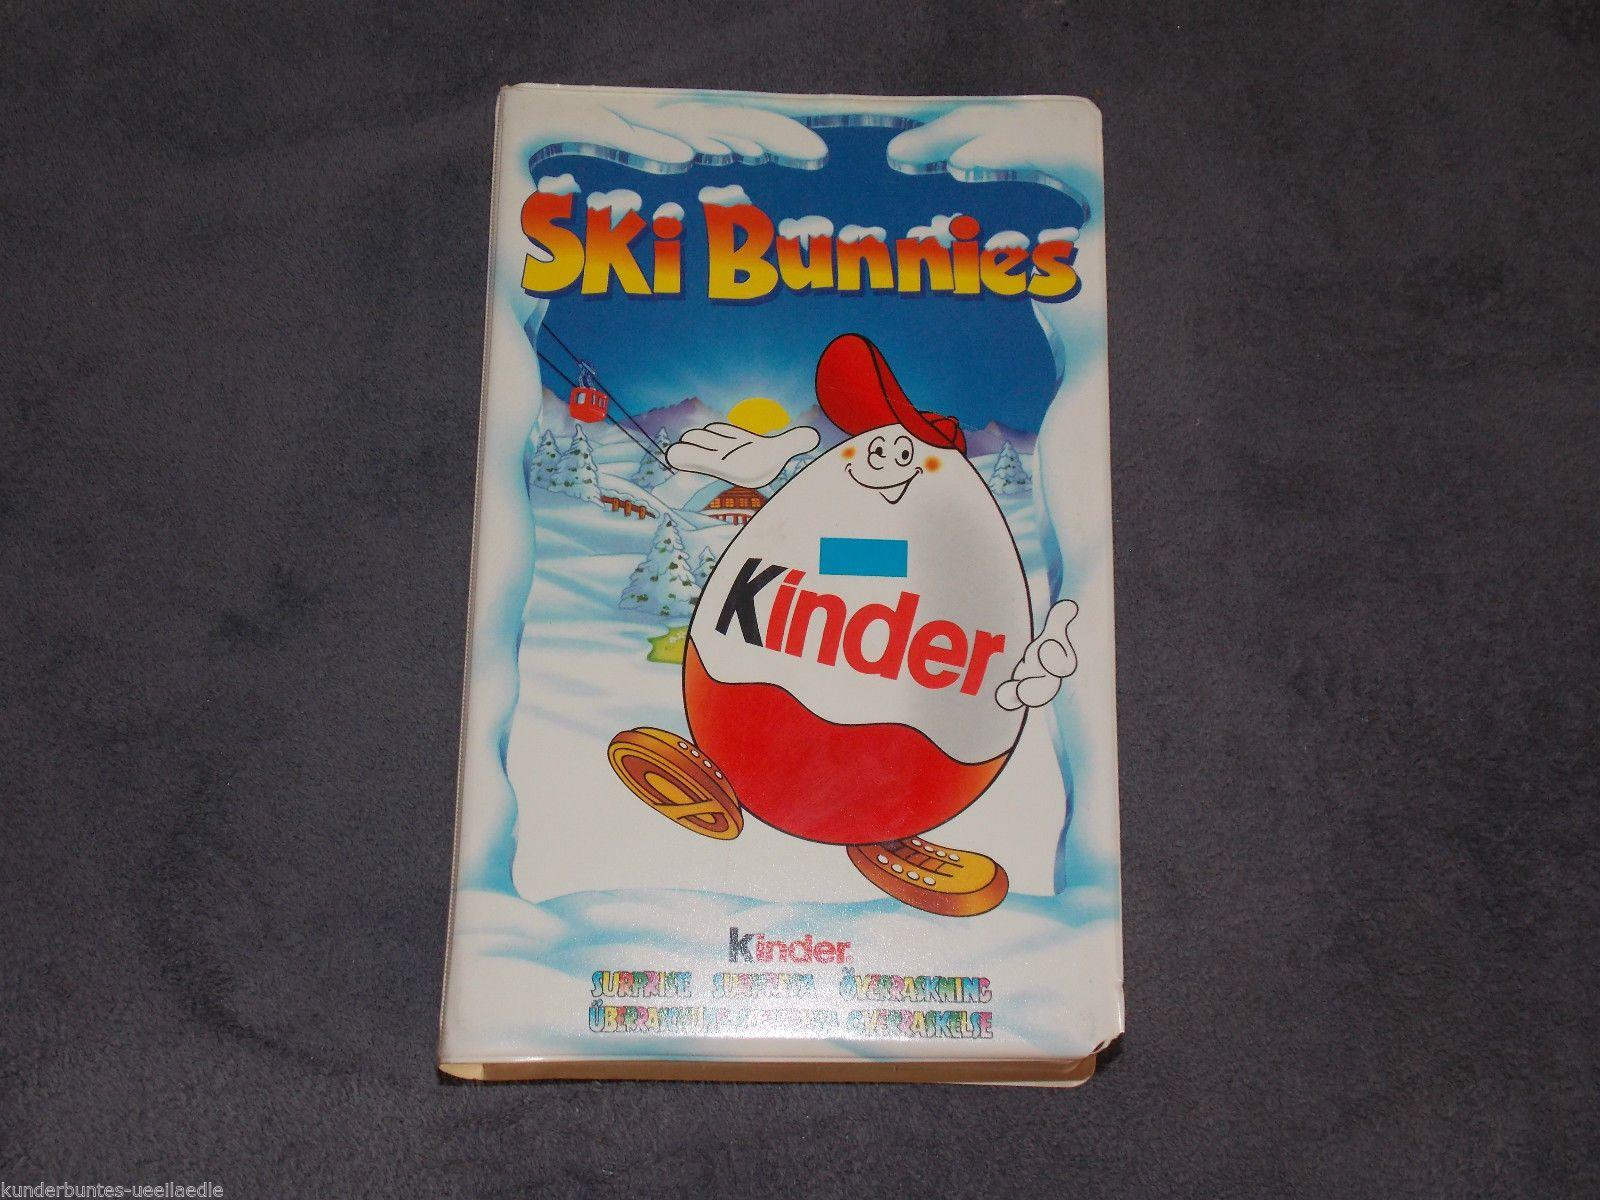 Buchhüllendiorama Diorama Ski Bunnies EU Kinder Surprise | eBay